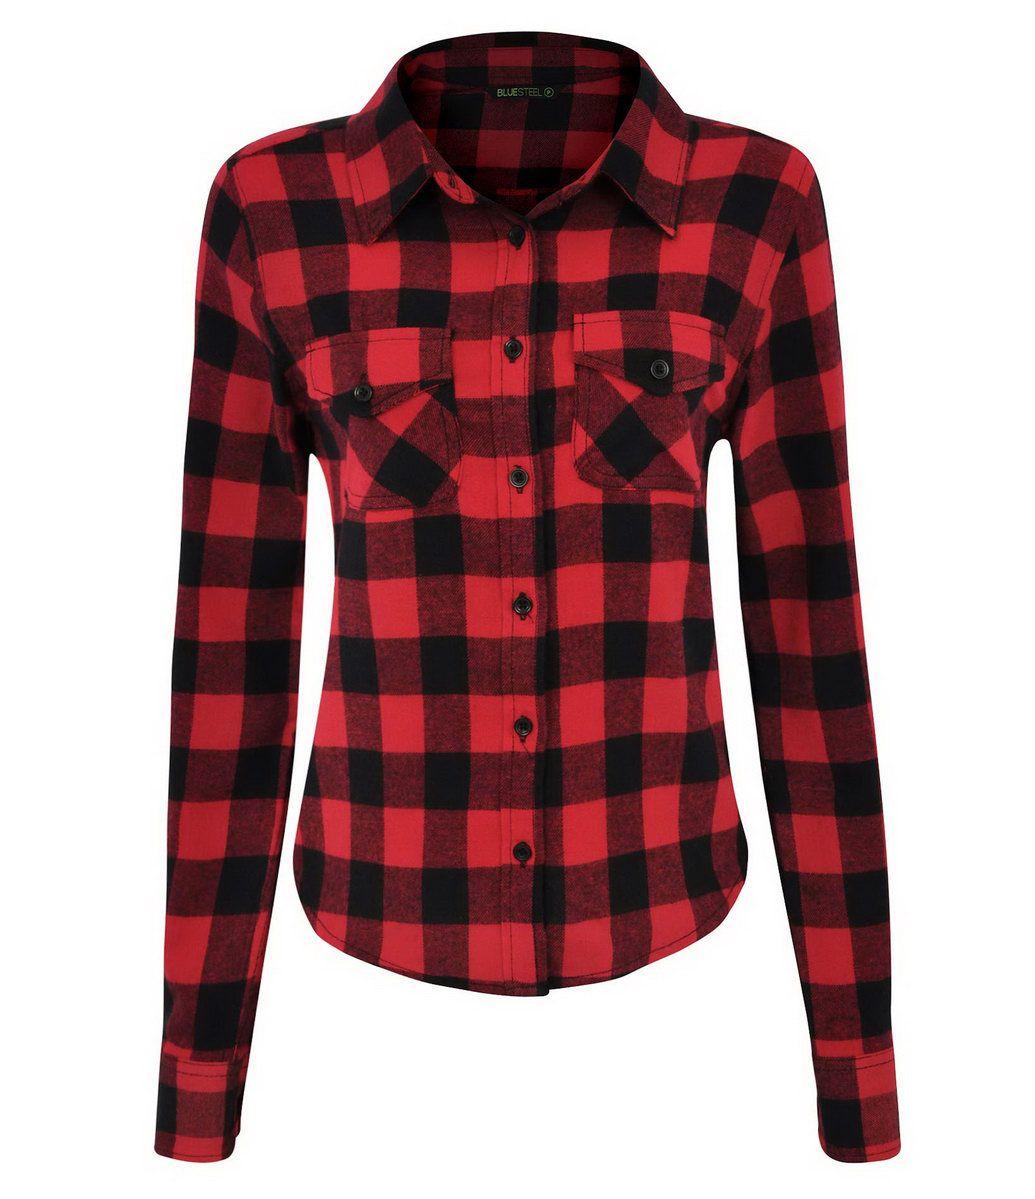 bd6a370b70 Camisa Feminina Xadrez em Flanela - Lojas Renner … | clothes/stuff ...